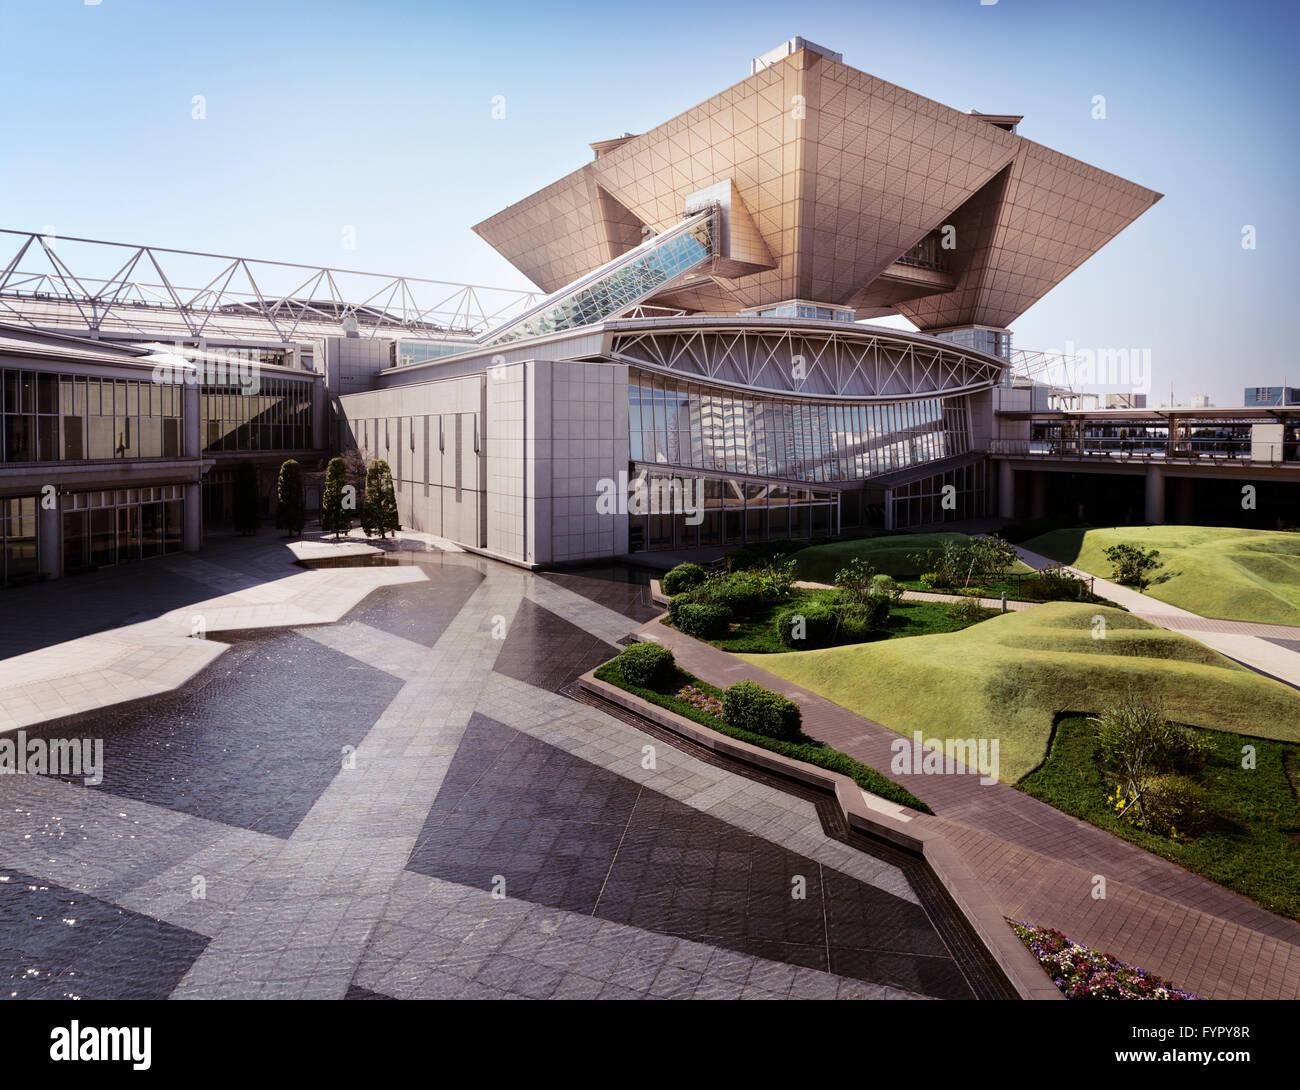 Tokyo Big Sight, or Tokyo International Exhibition Center, Ariake, Tokyo, Japan - Stock Image